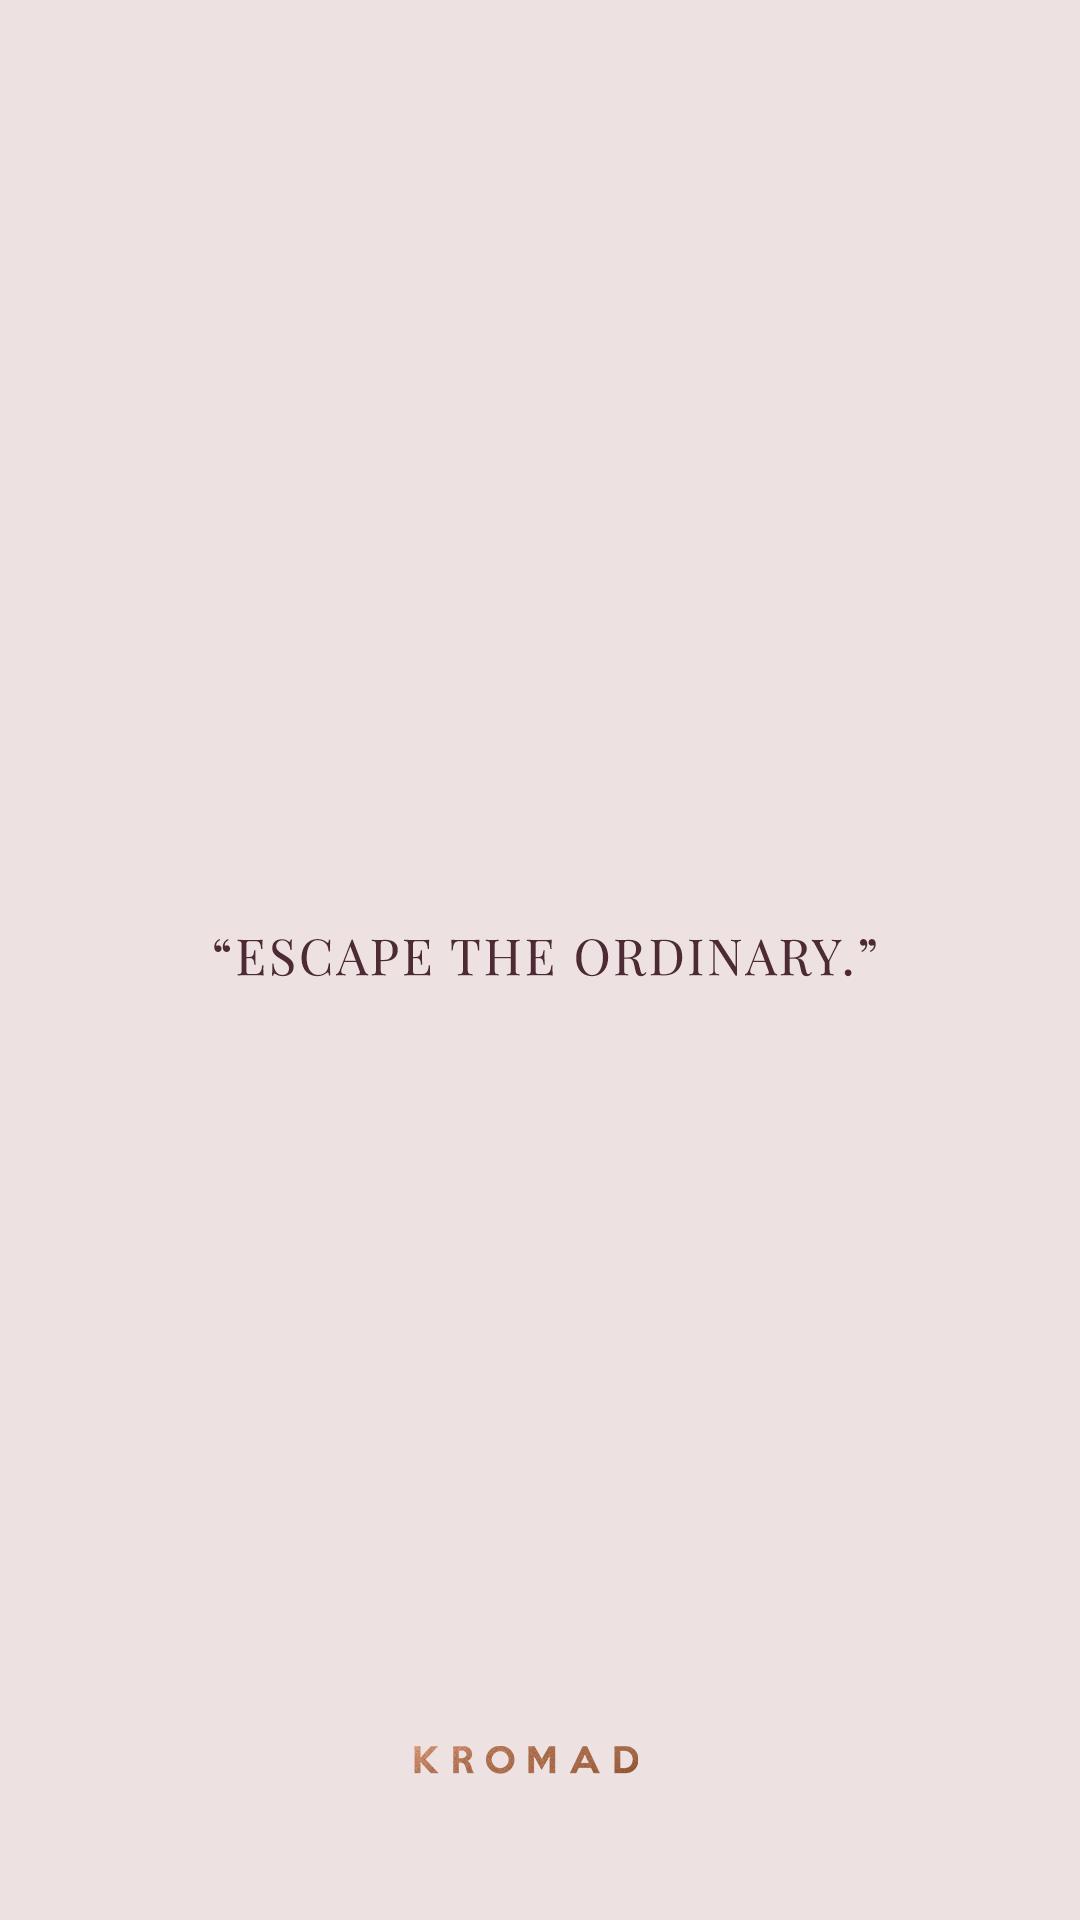 Escape The Ordinary Motivational Quote Short Quotes Bio Quotes Motivational Quotes